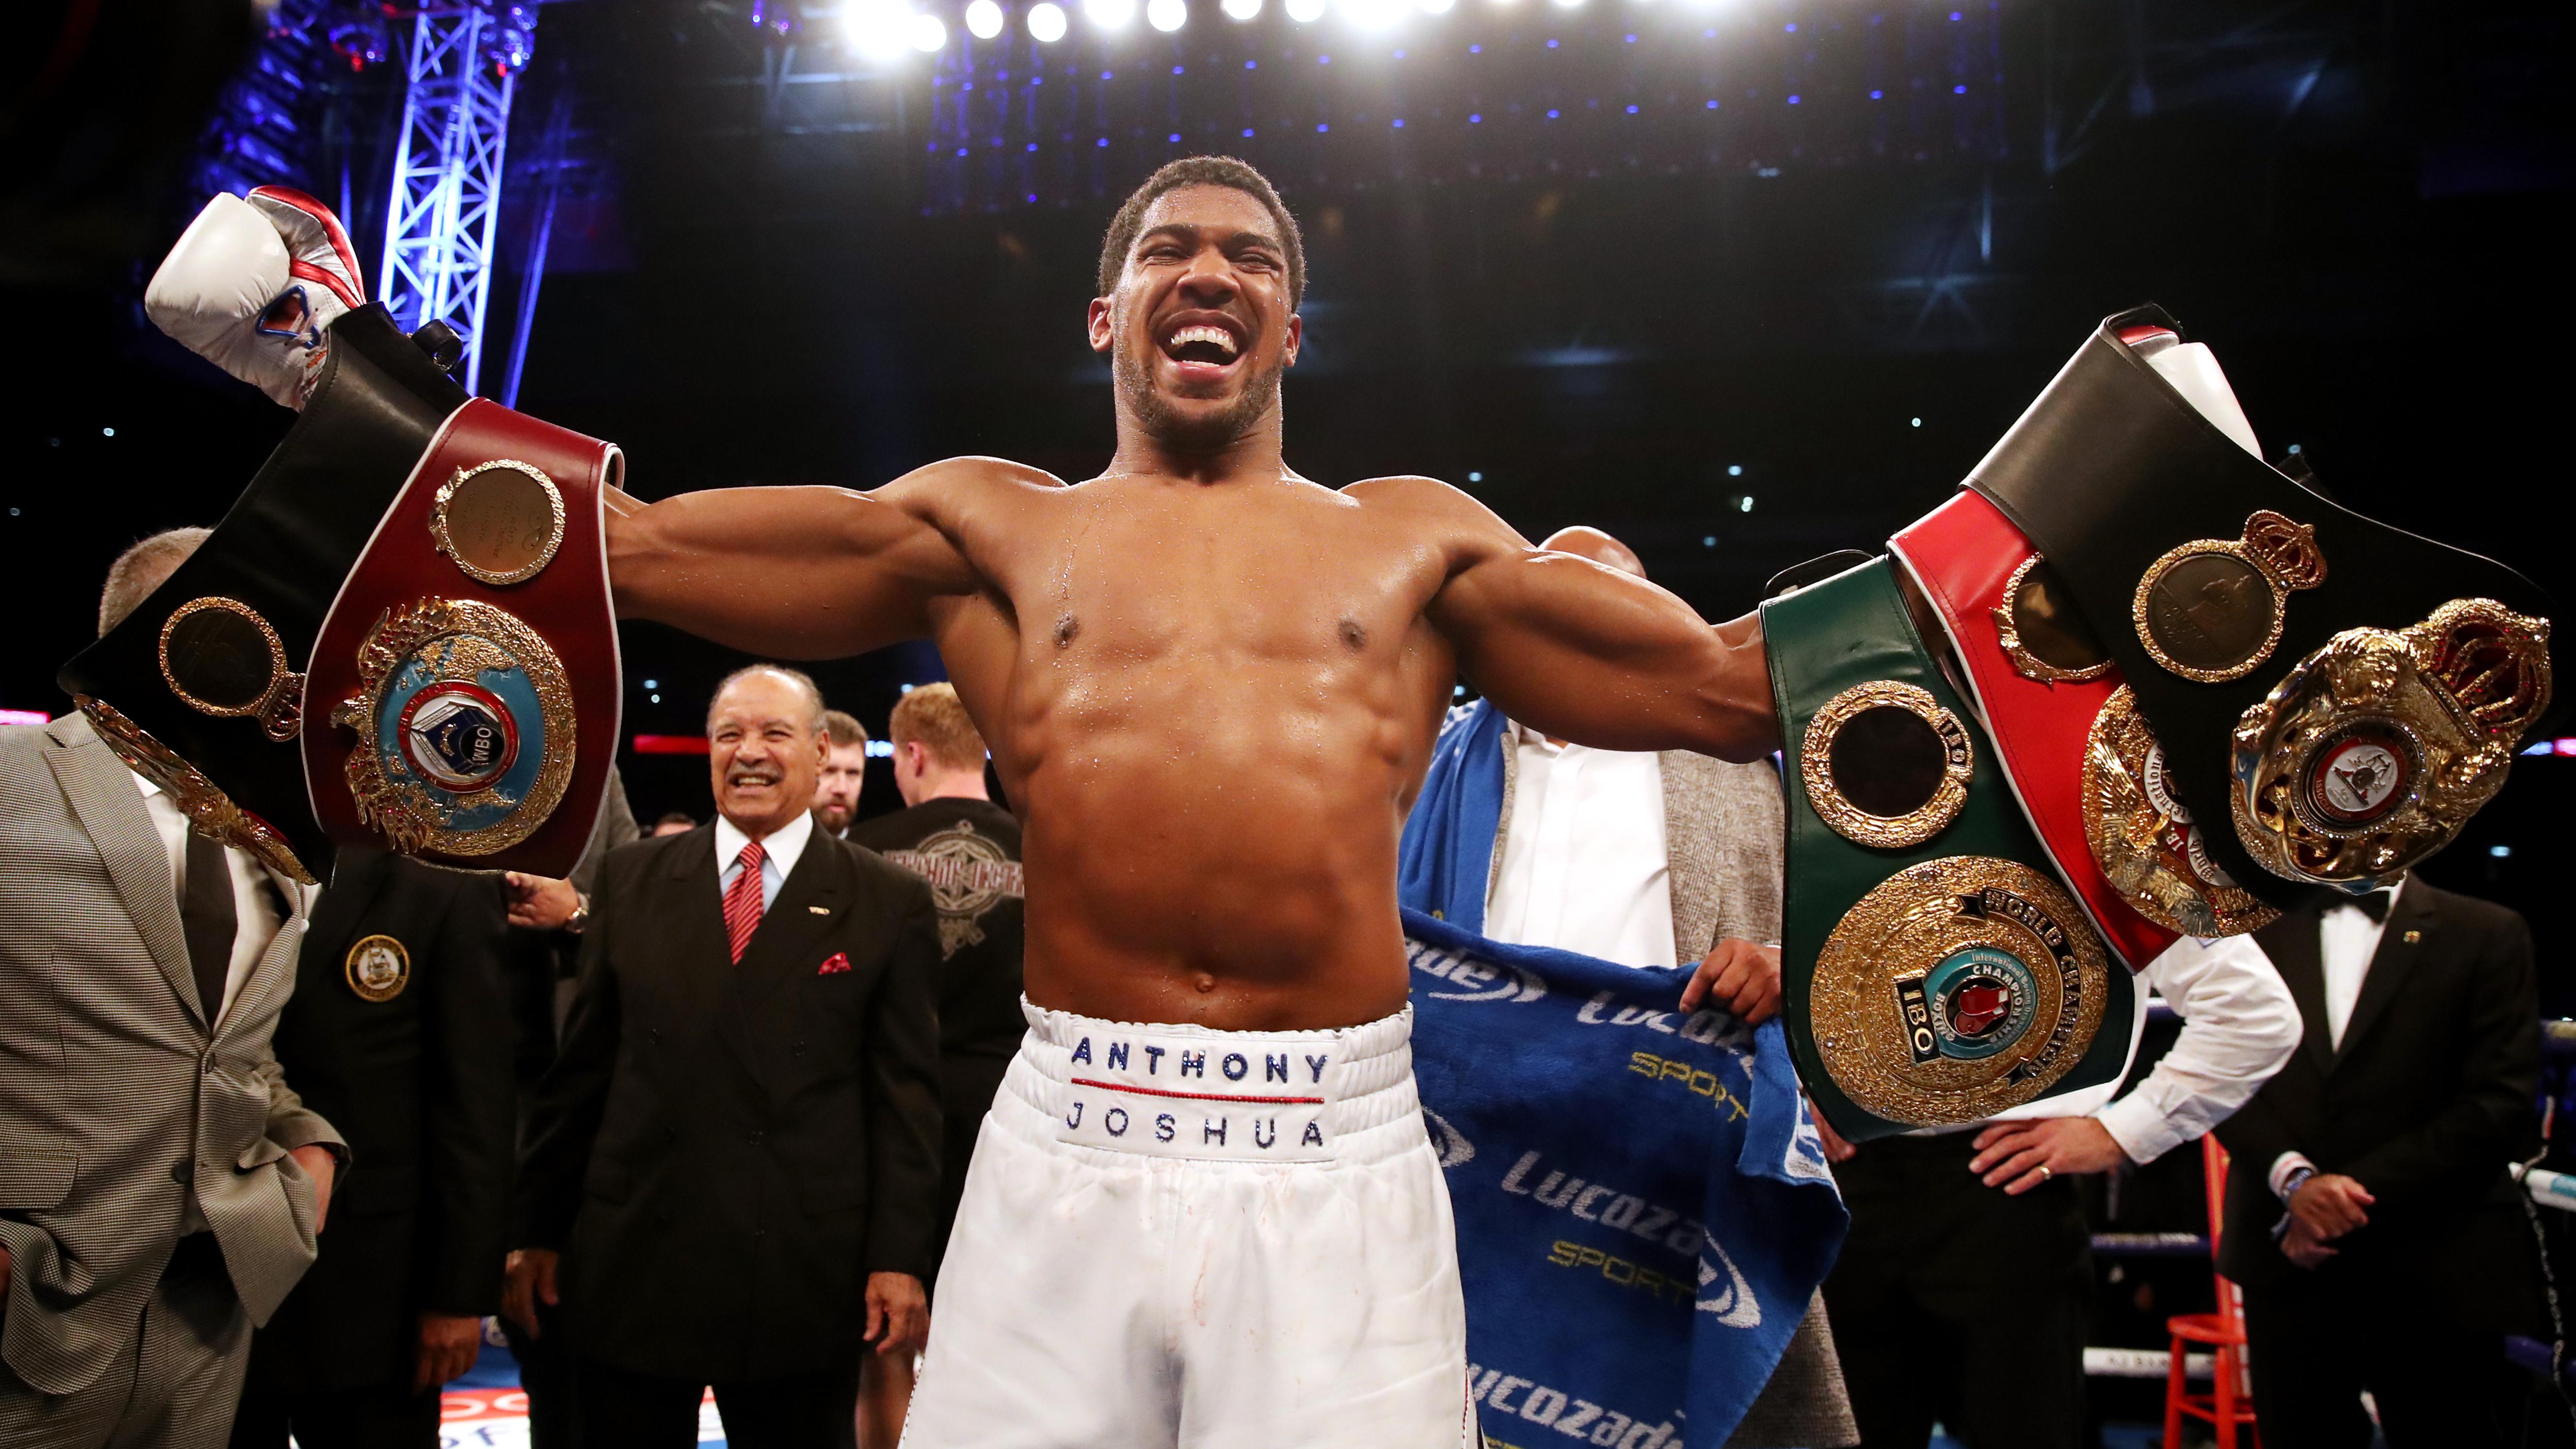 Anthony Joshua Wants Deontay Wilder Or Tyson Fury Fight